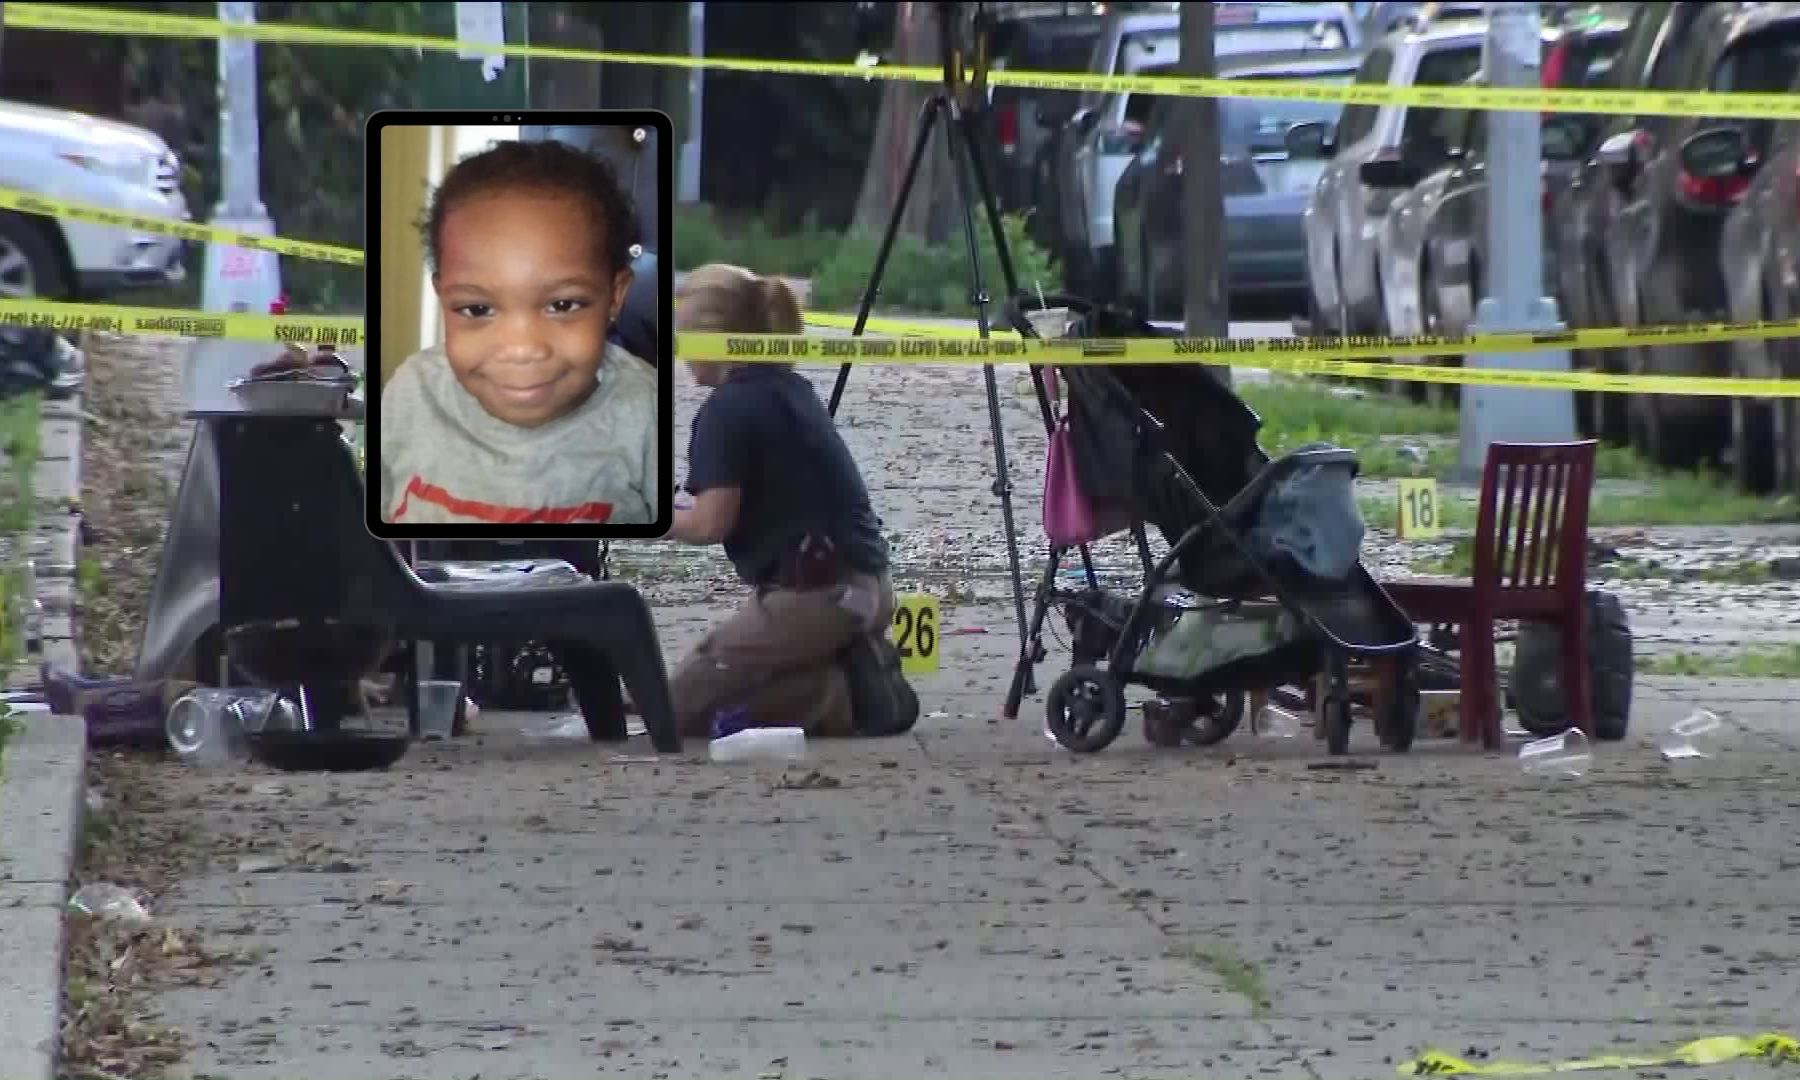 1-year-old boy shot and killed in brooklyn